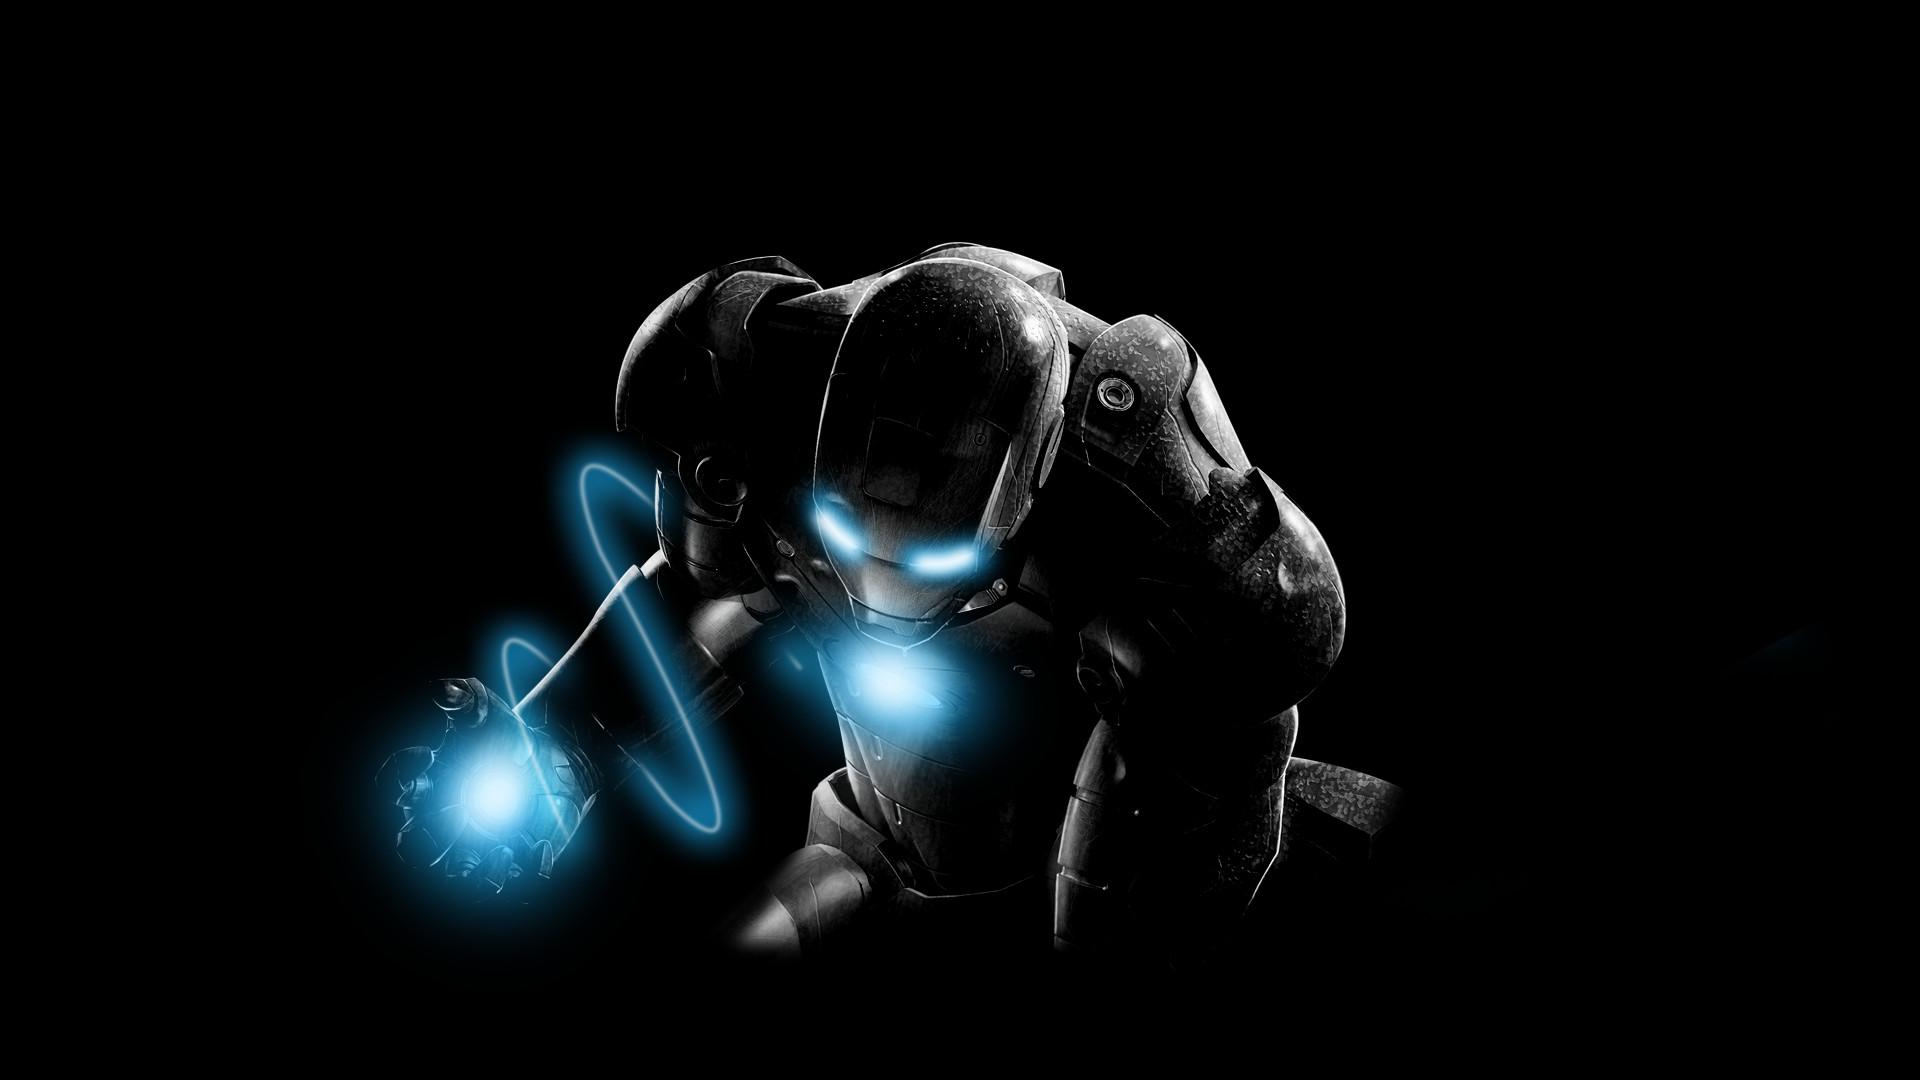 Iron Man HD Wallpaper  ( ^ o ^ ) / ~ (17 wallpapers)